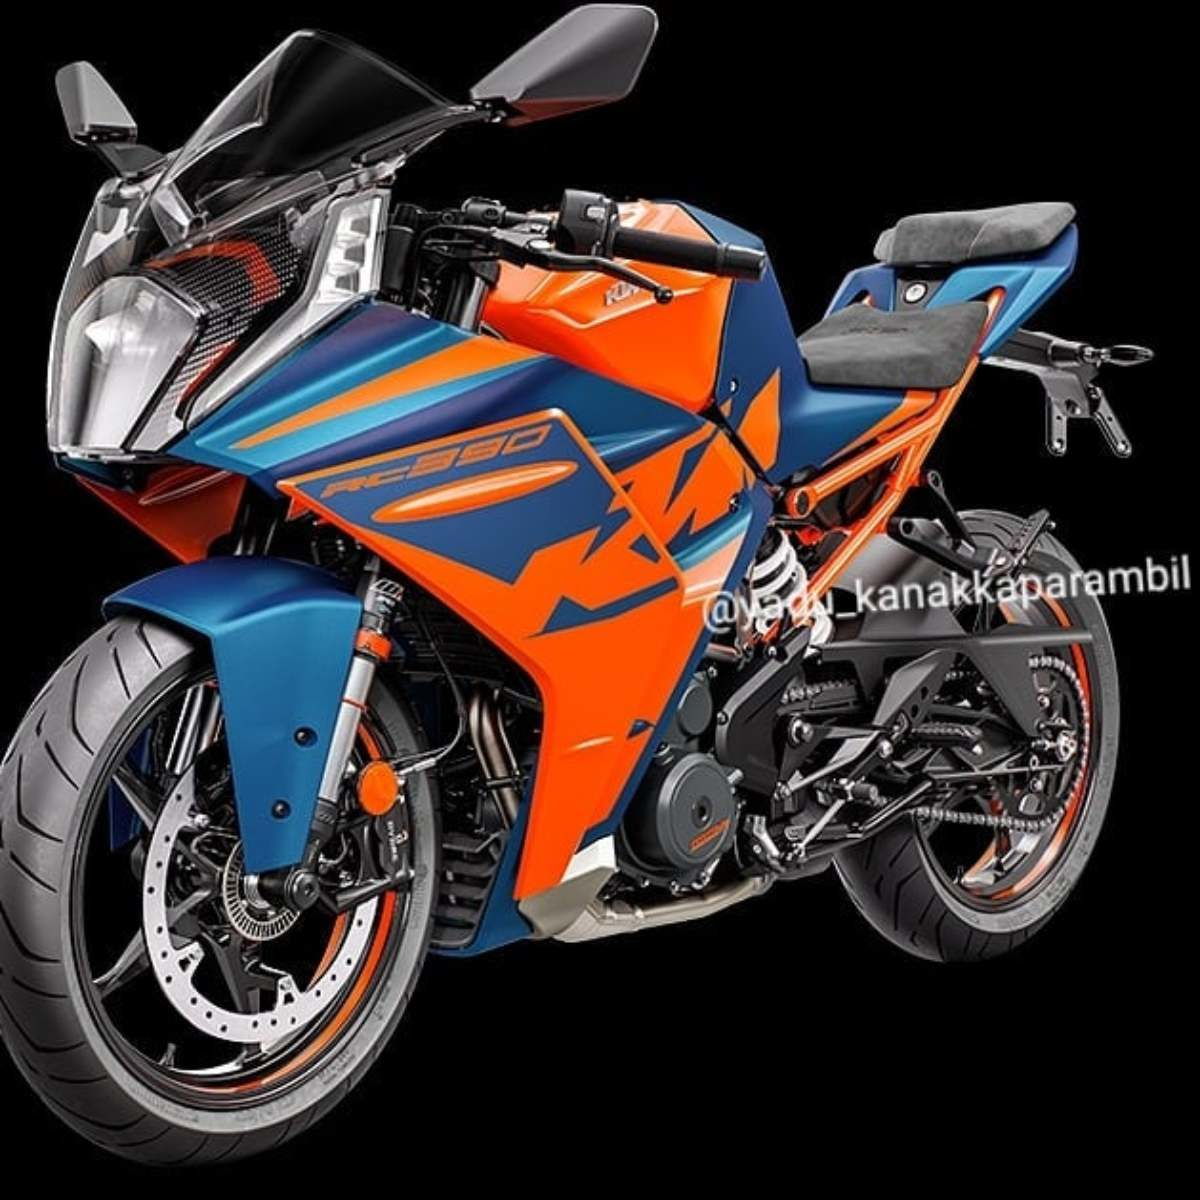 2022 KTM RC 390 Leaked (4)